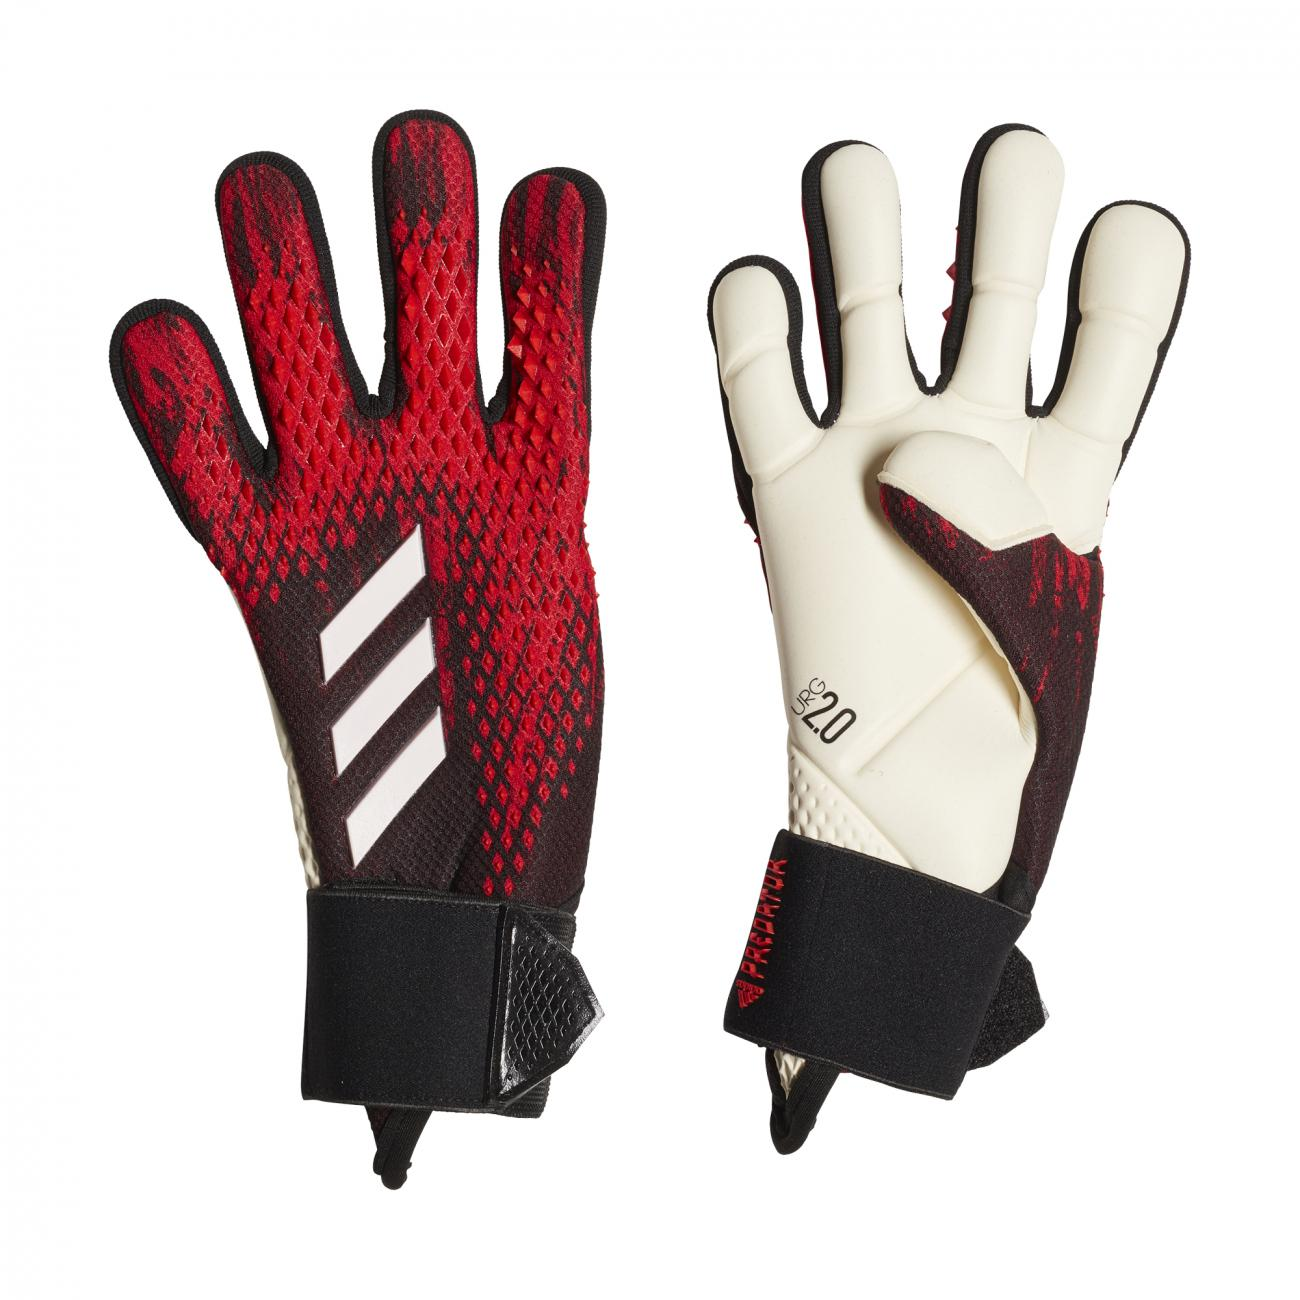 Adidas Predator Pro 20 Jr. online kopen